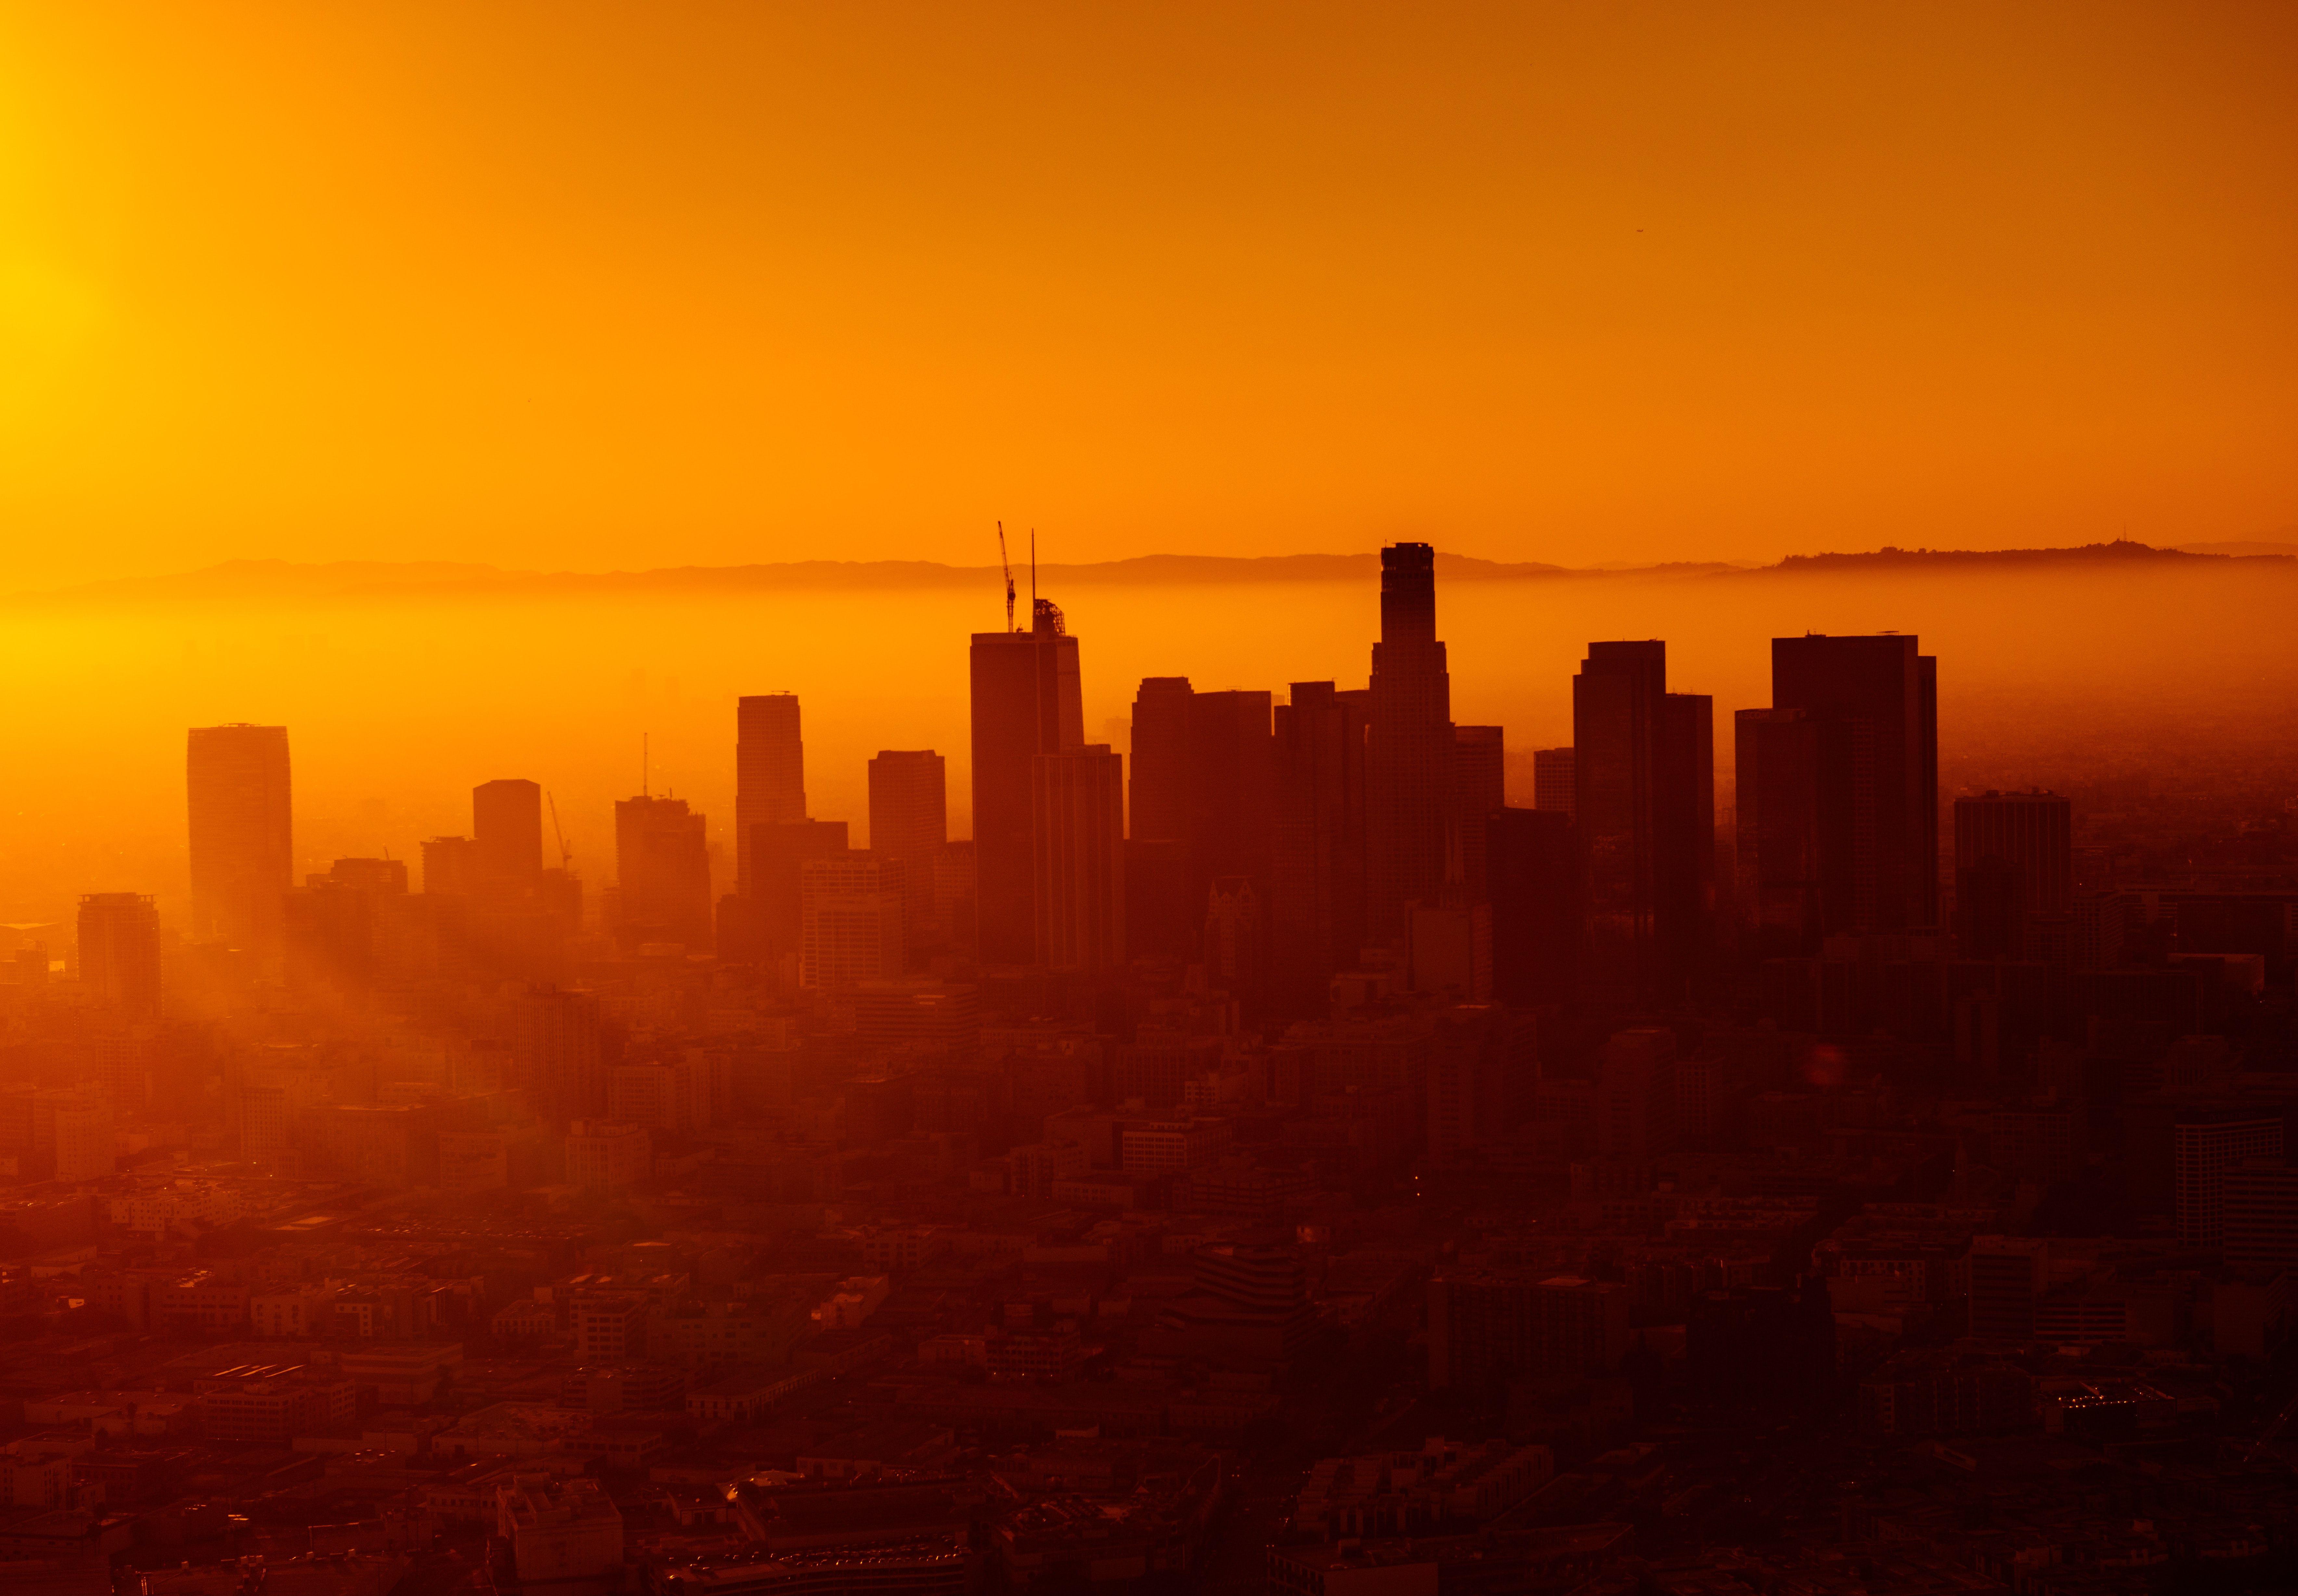 Silhouette Photo Of City Skyline Aesthetic Backgrounds Orange Aesthetic Silhouette Photos